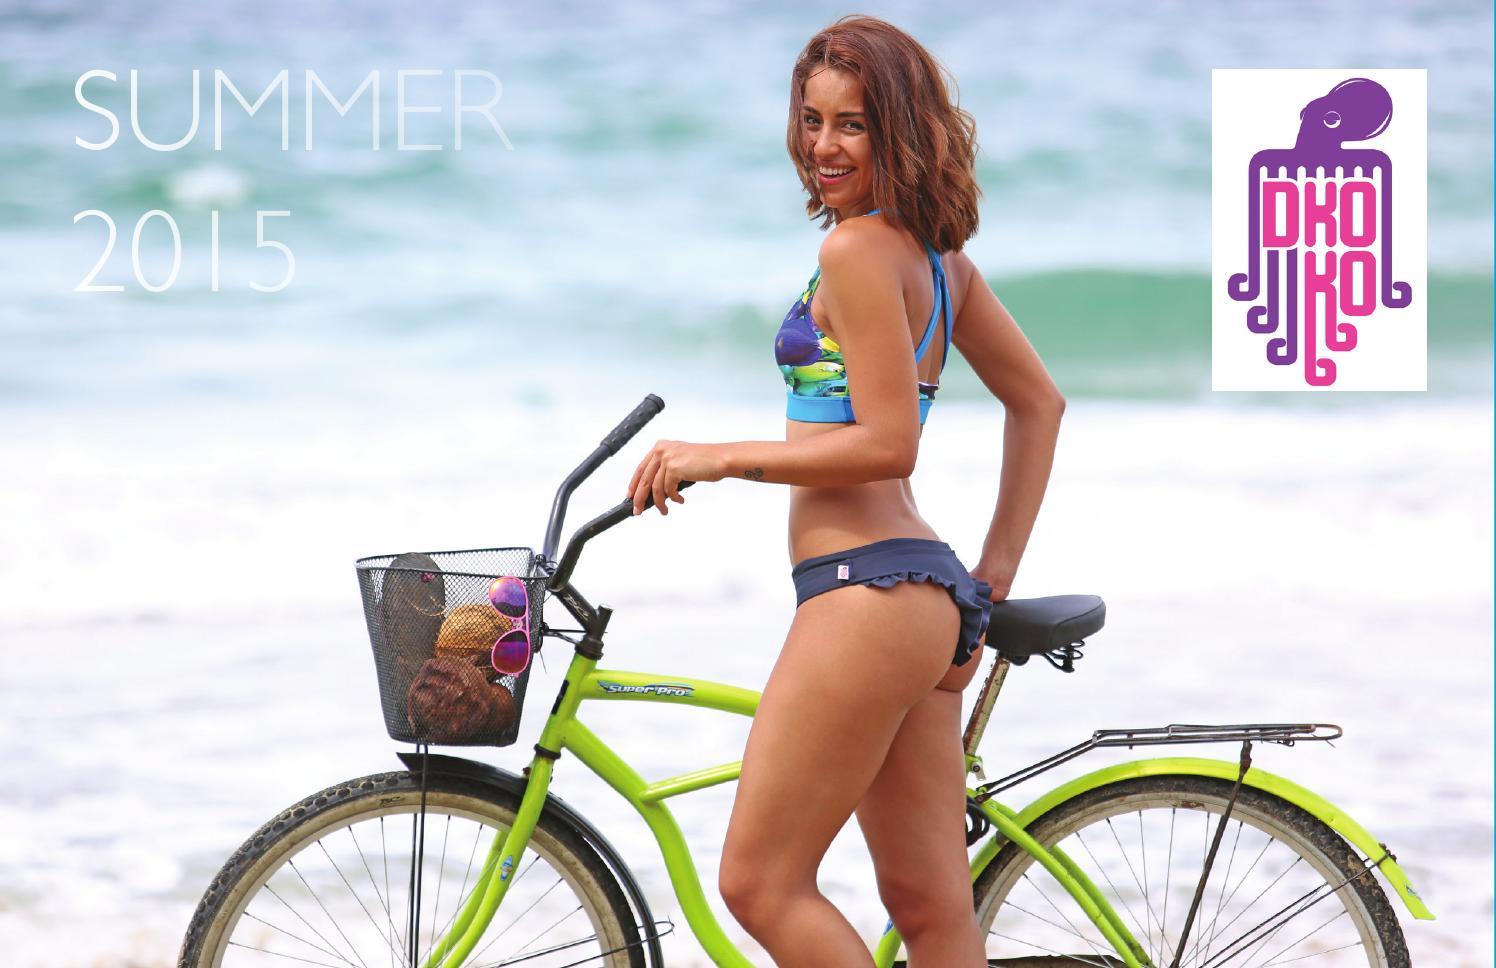 Bikinis sports bike, nepali sex girl